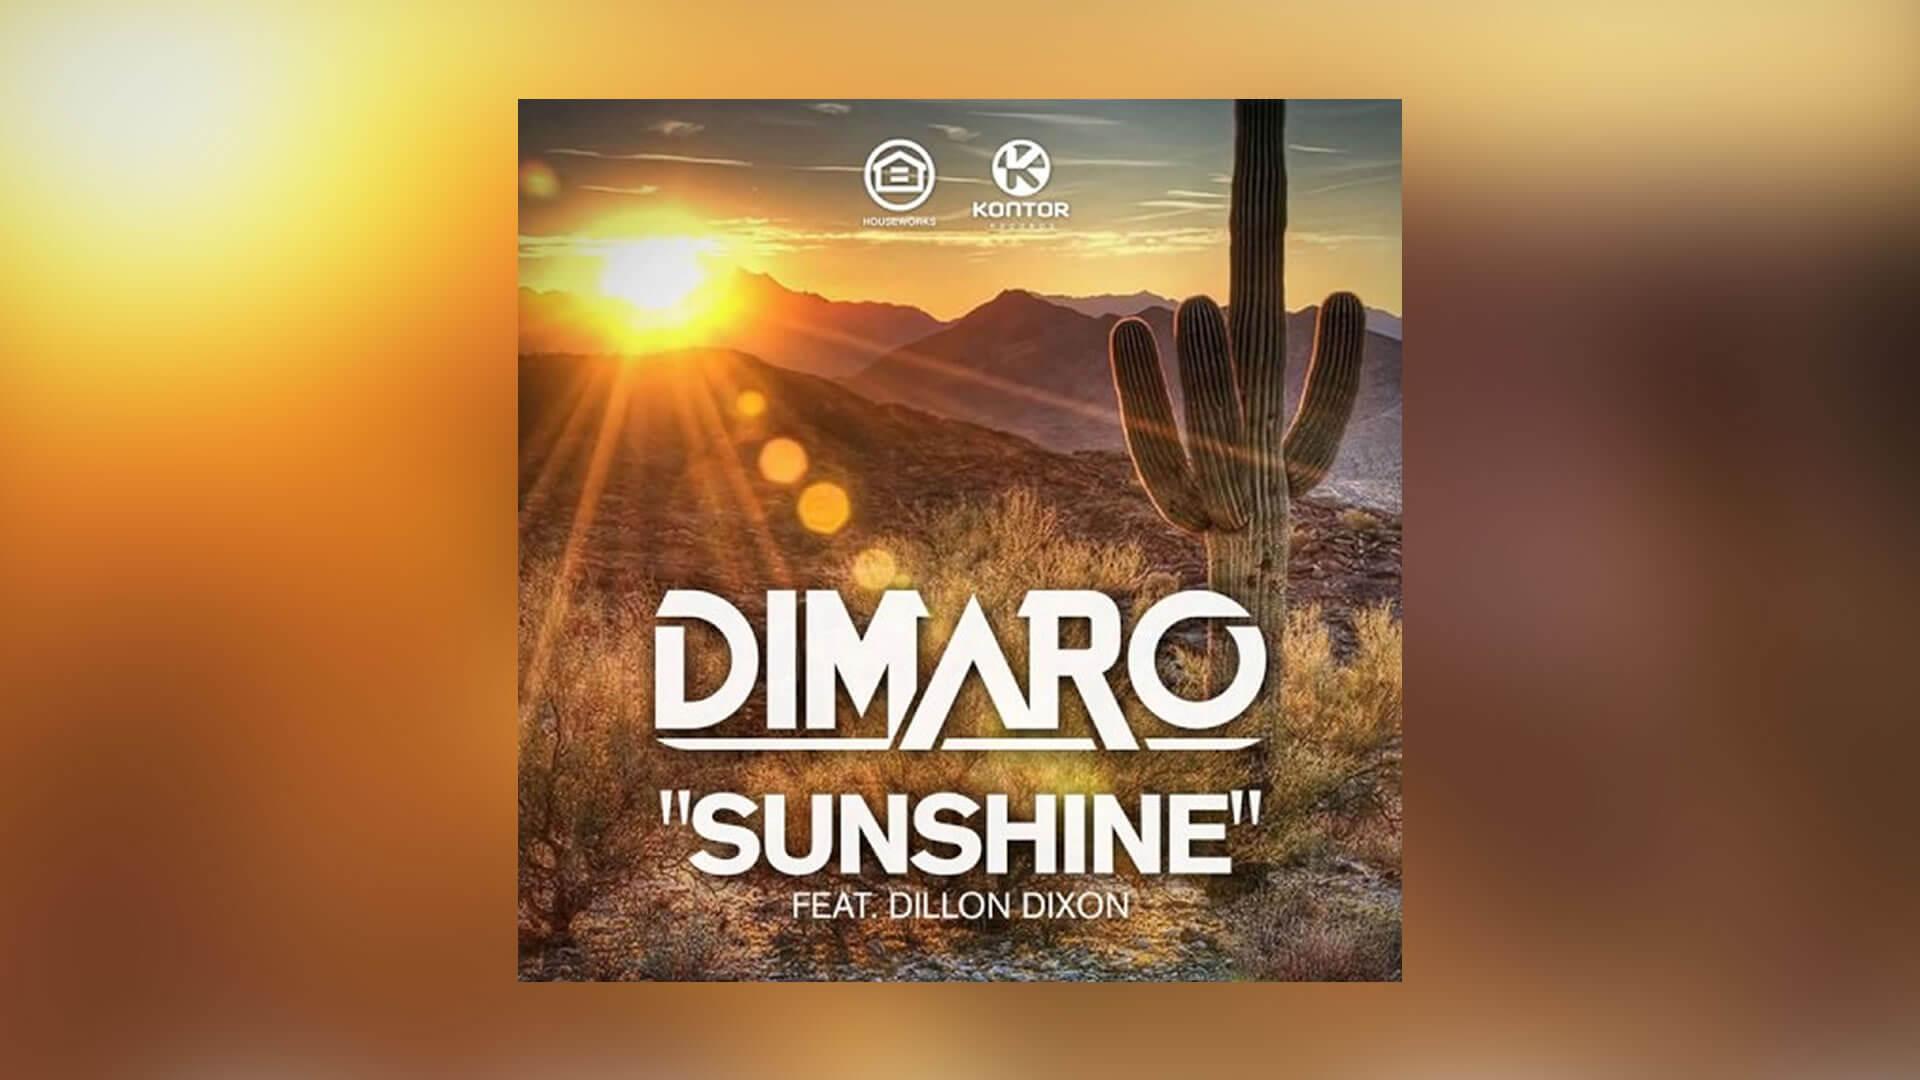 Just Spotted: Dimaro featuring Dillon Dixon - Sunshine